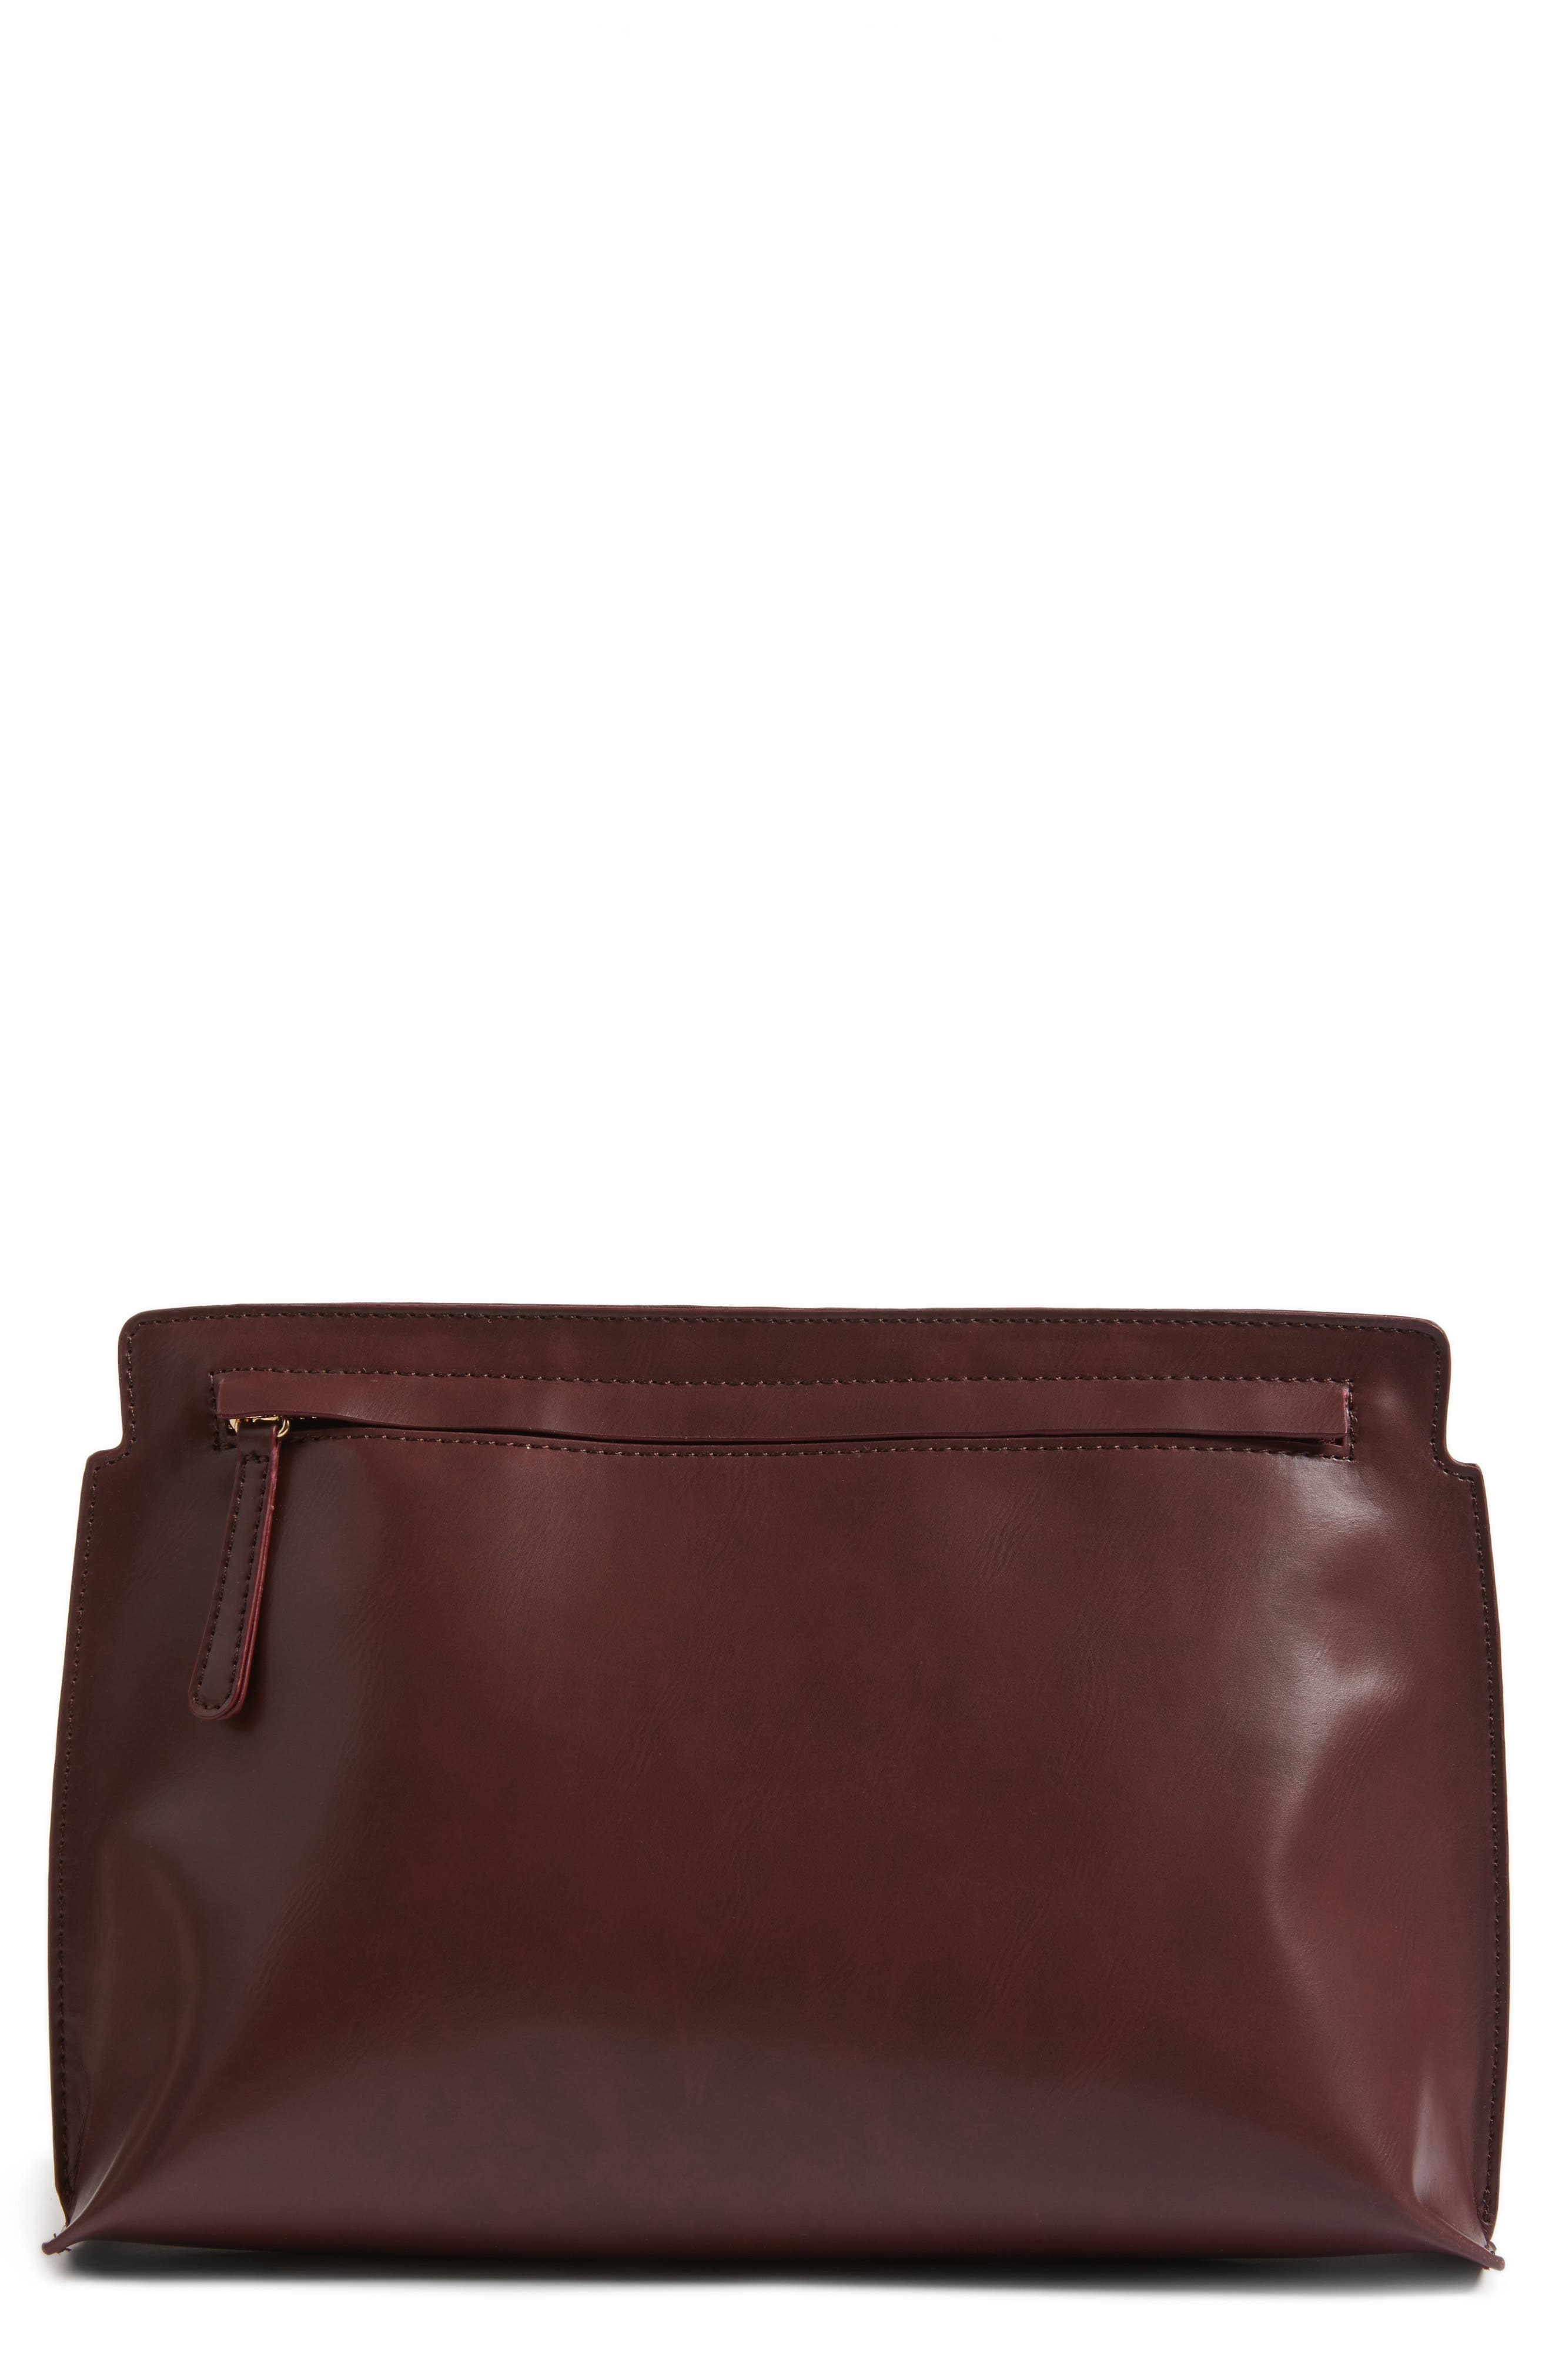 BP. Faux Leather Clutch